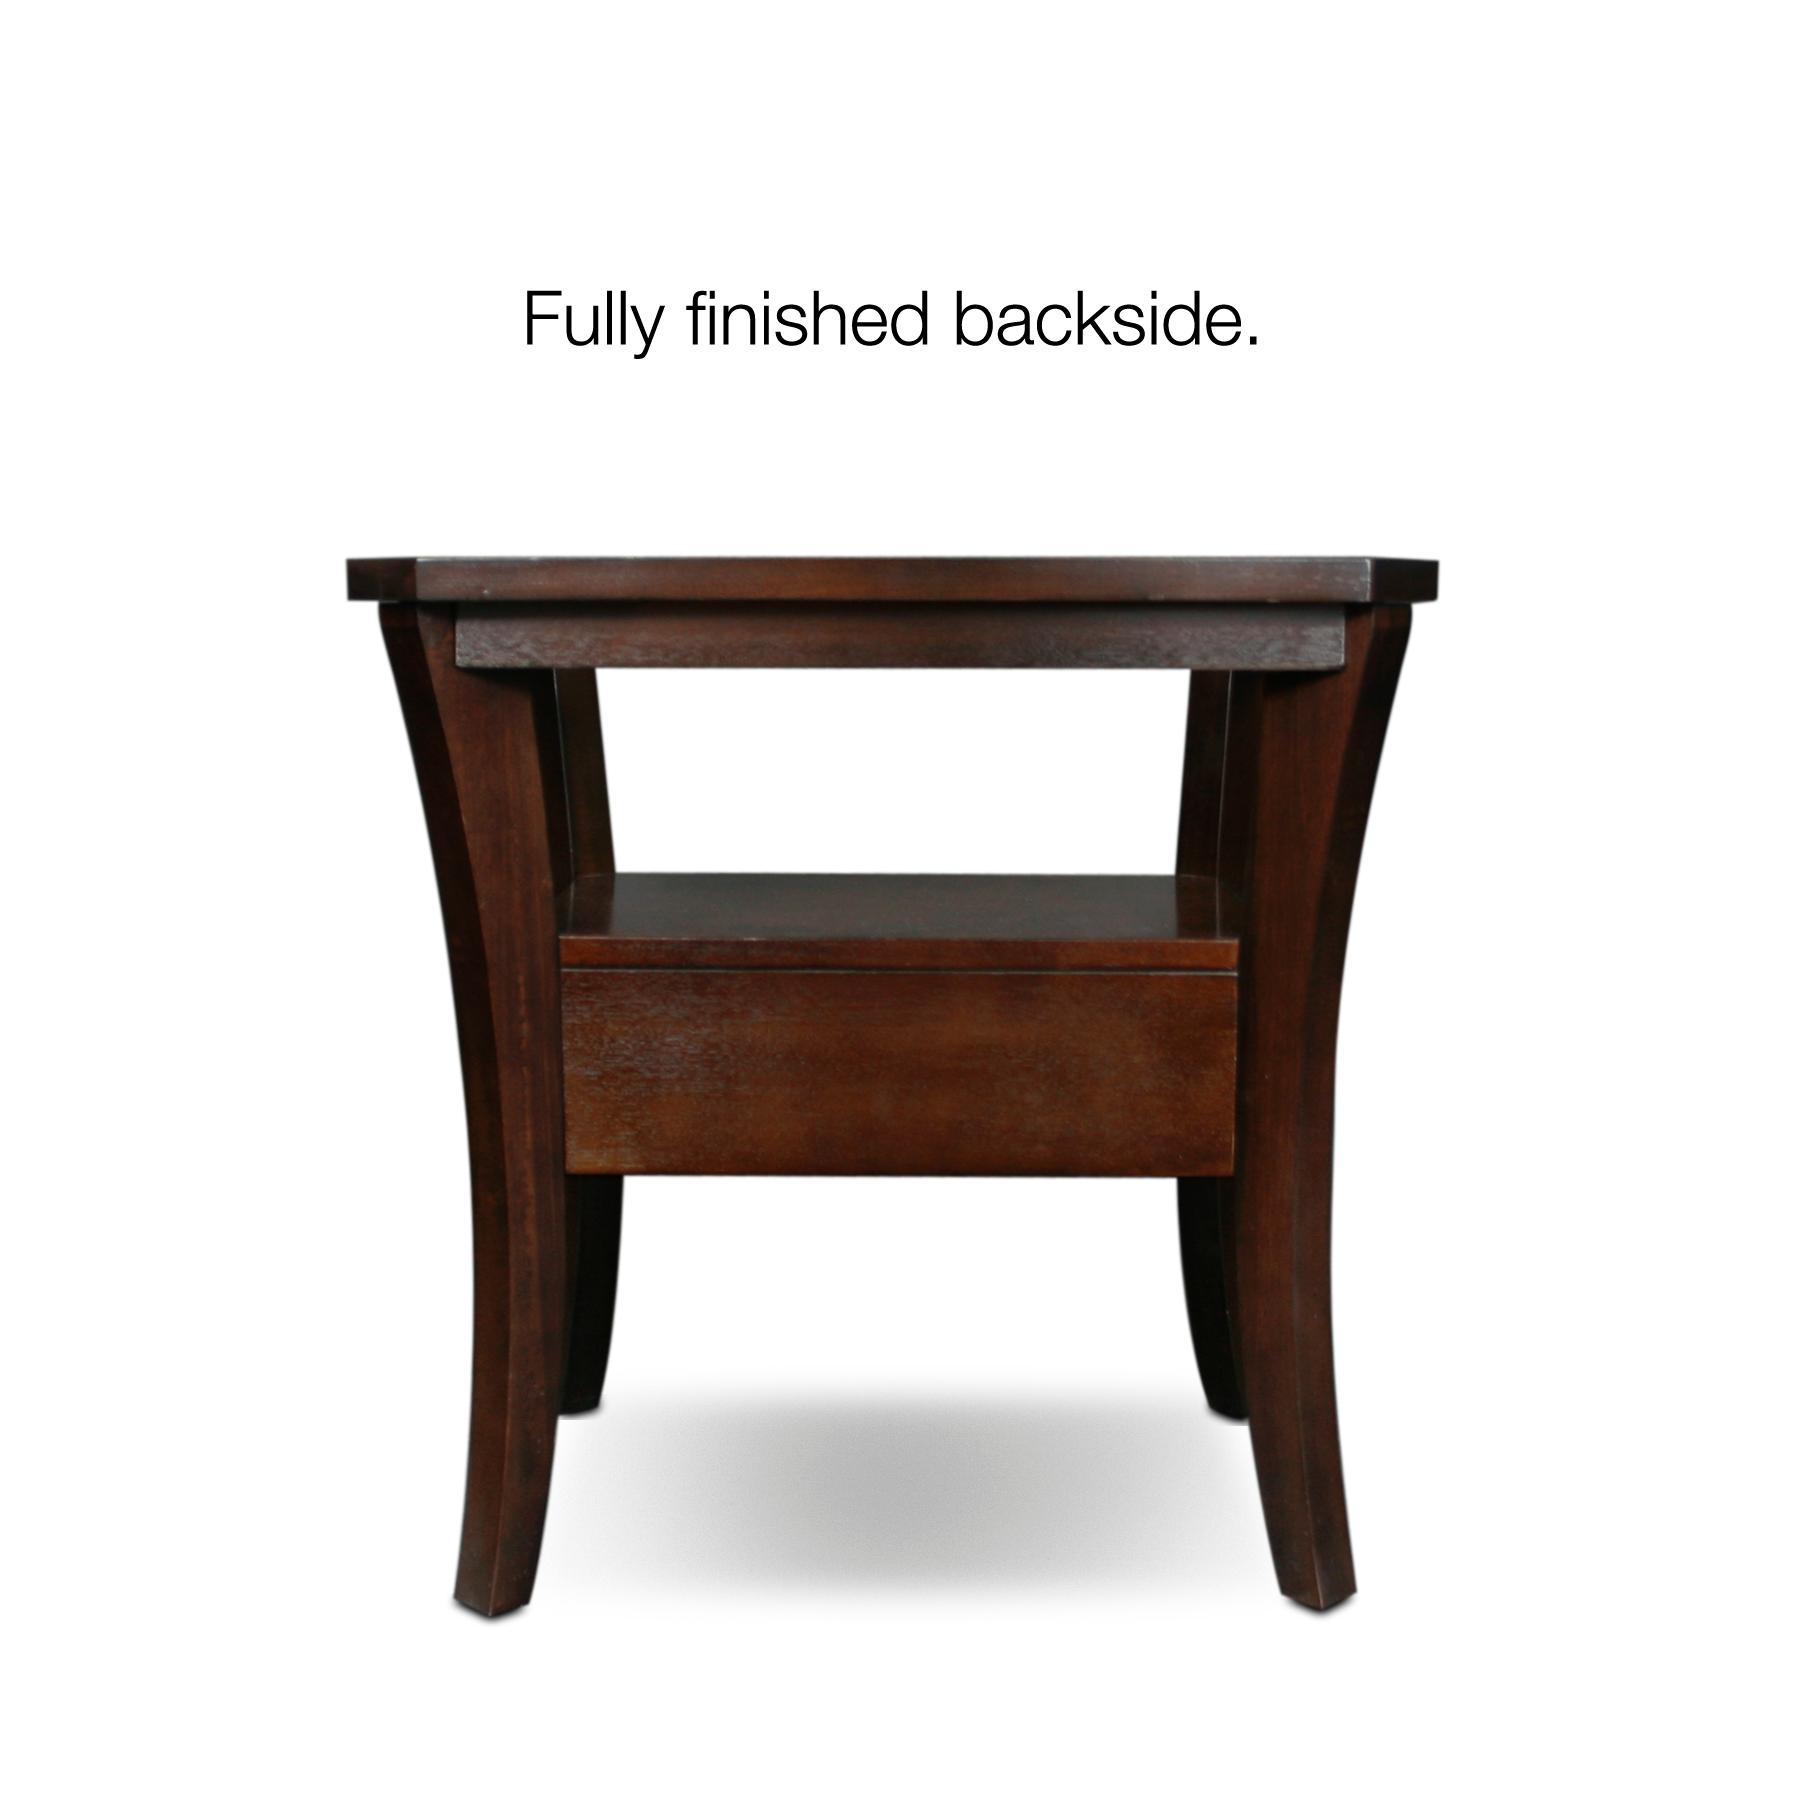 Amazon.com - Leick Furniture Boa Collection Glass Top